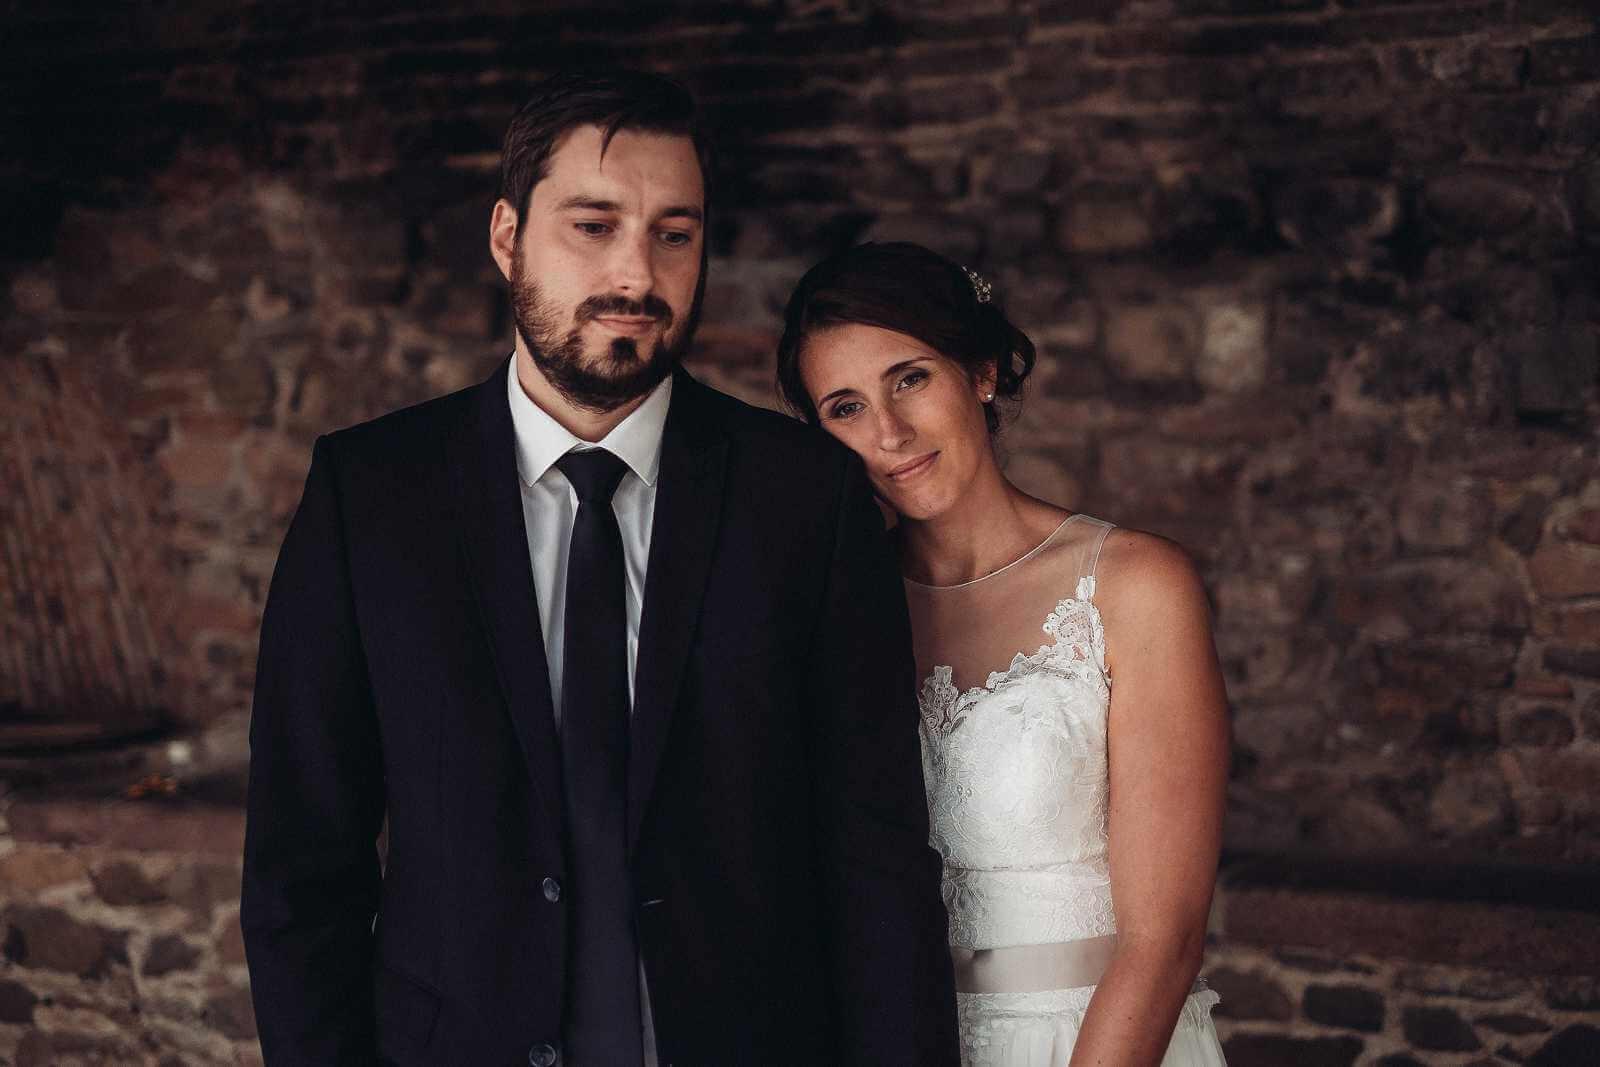 Hochzeitsfotograf Offenburg Zell am Harmersbach Bärenkeller (33)